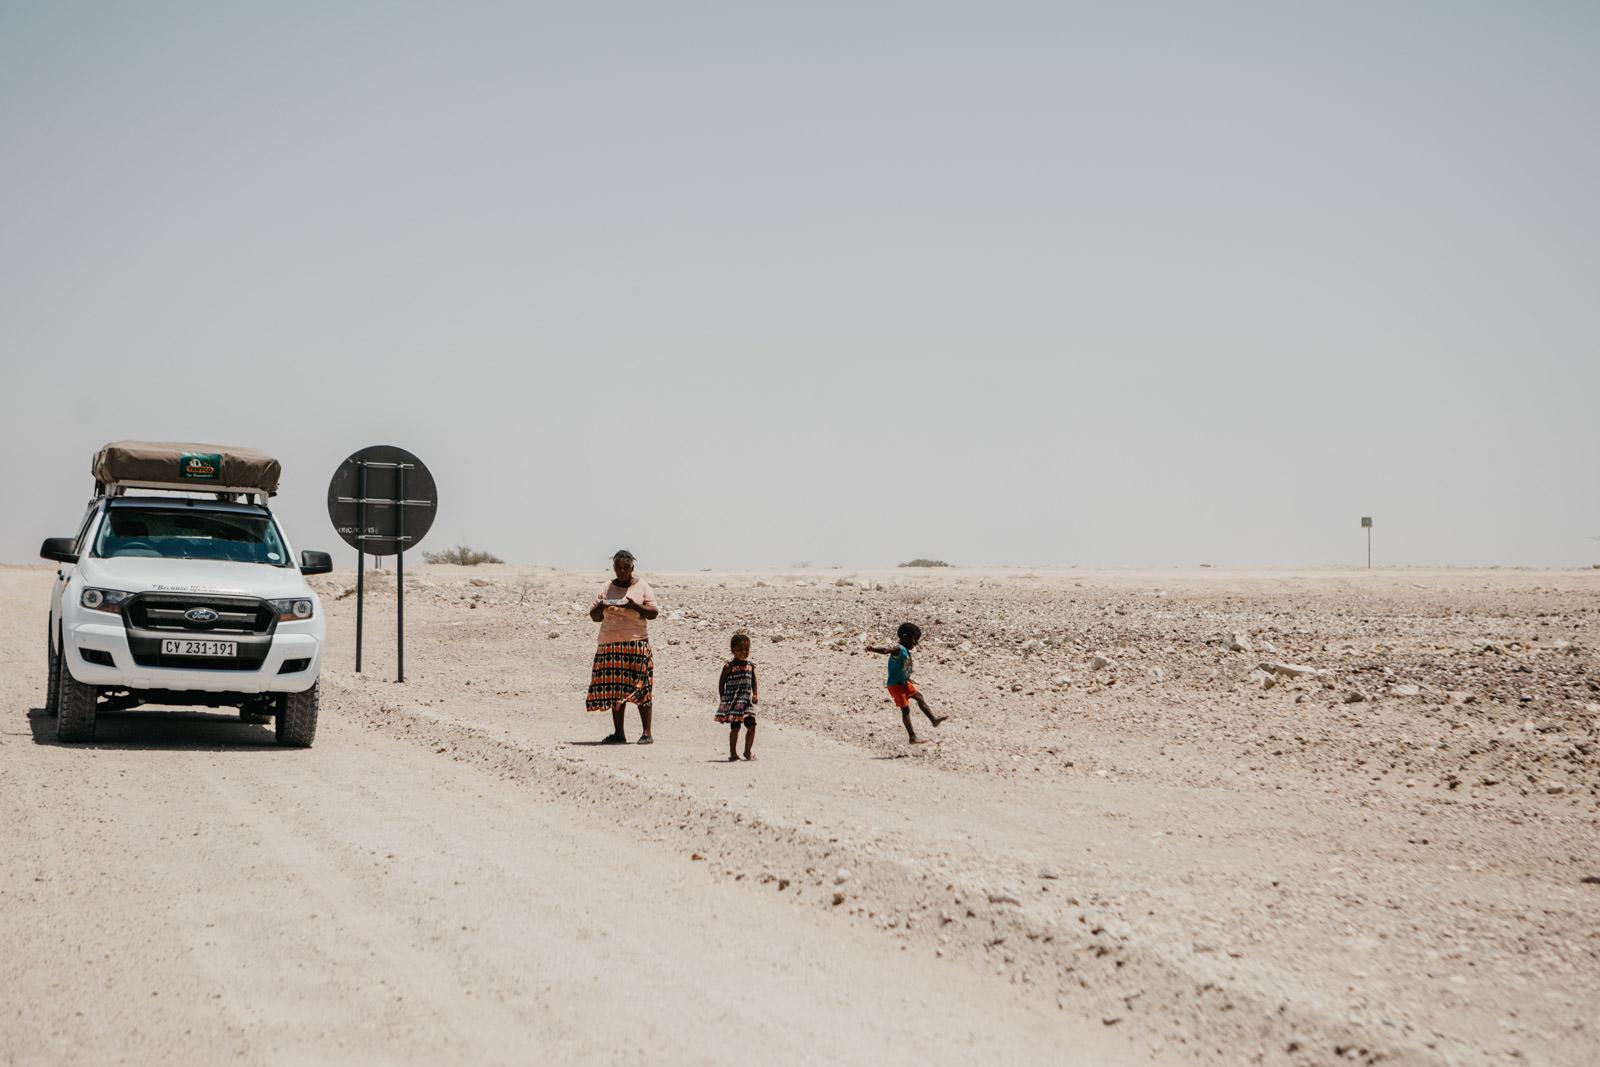 namibia_trip_rooftent_camping_roadtrip (2 von 18).jpg